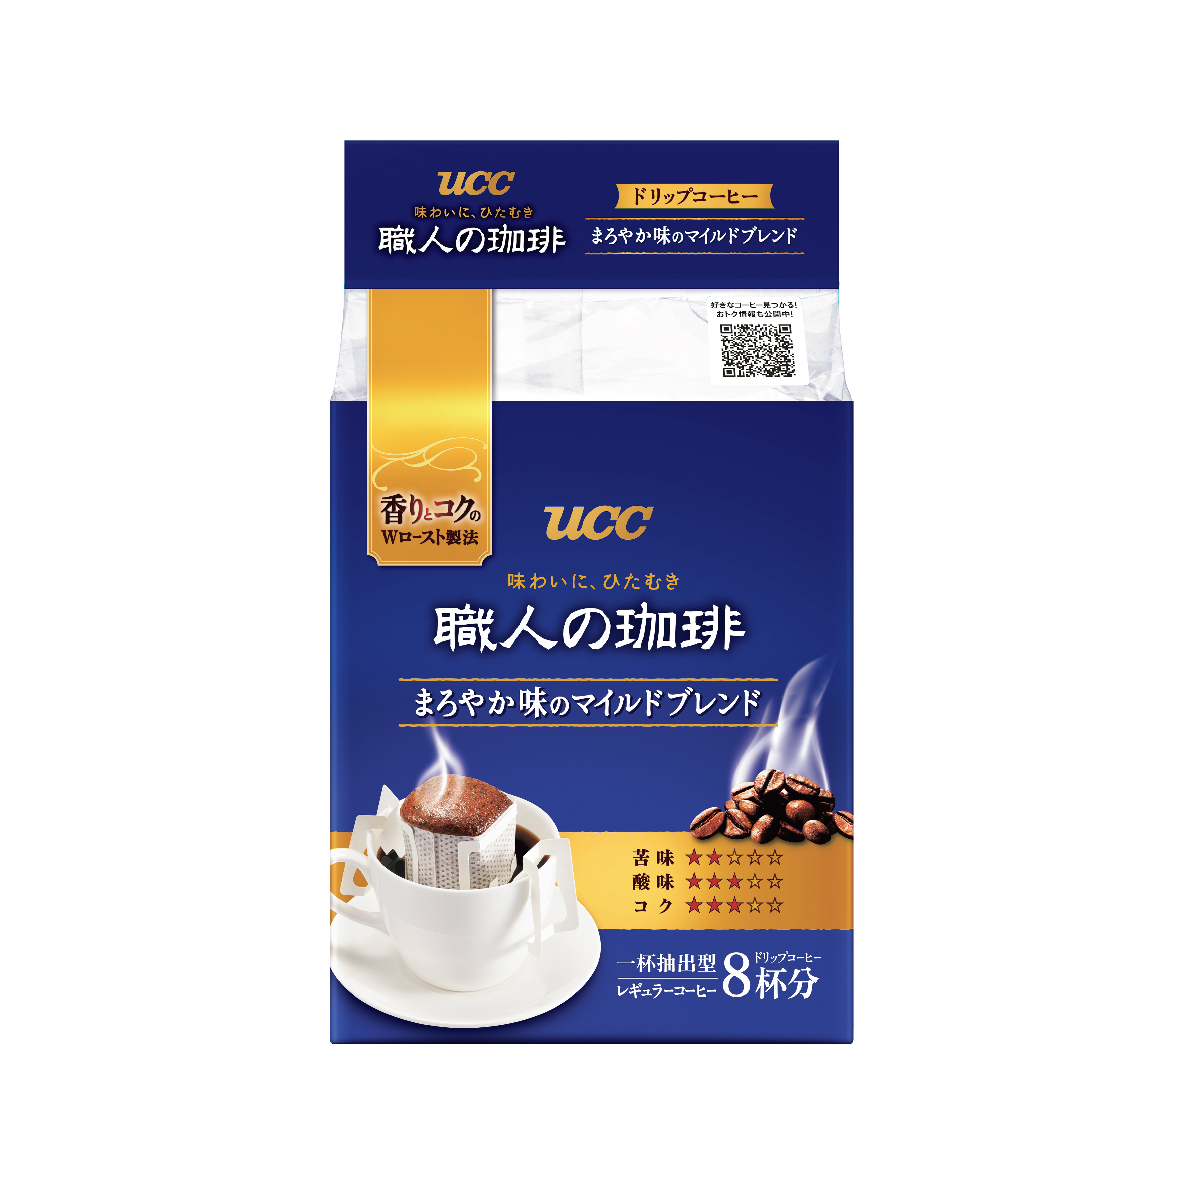 UCC Craftsman's Coffee Mild Drip Coffee